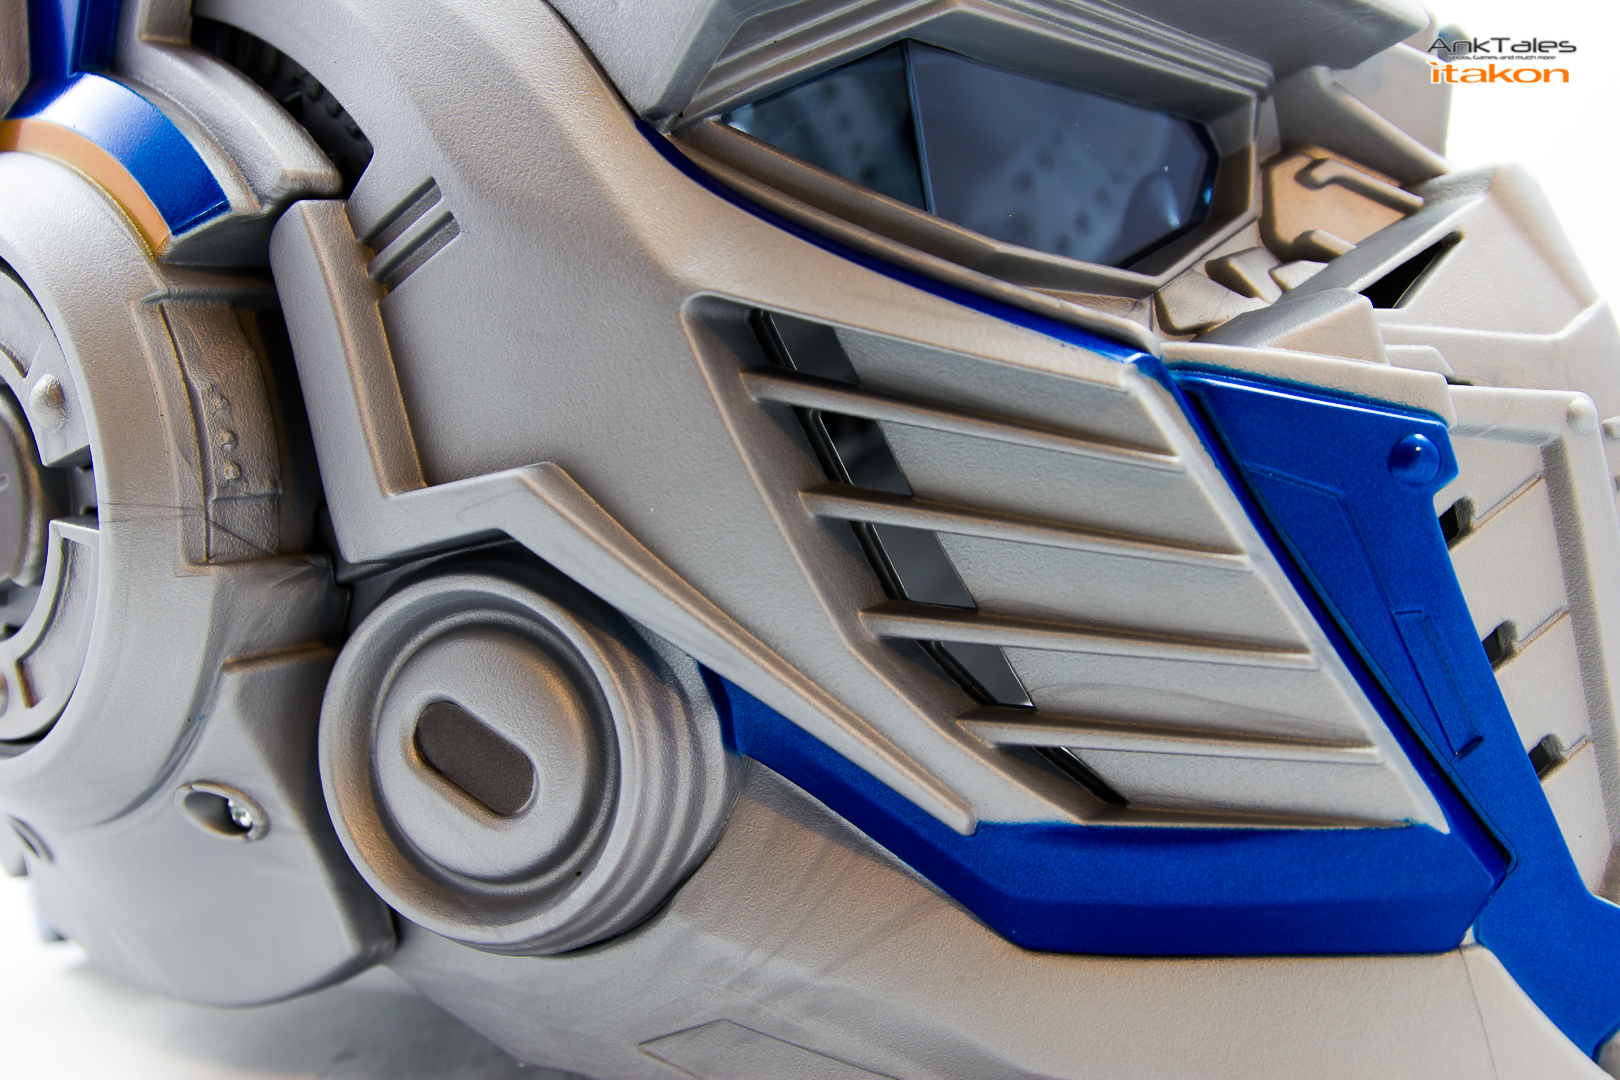 Link a Hasbro Optimus Prime helmet Anktales Itakon_0027